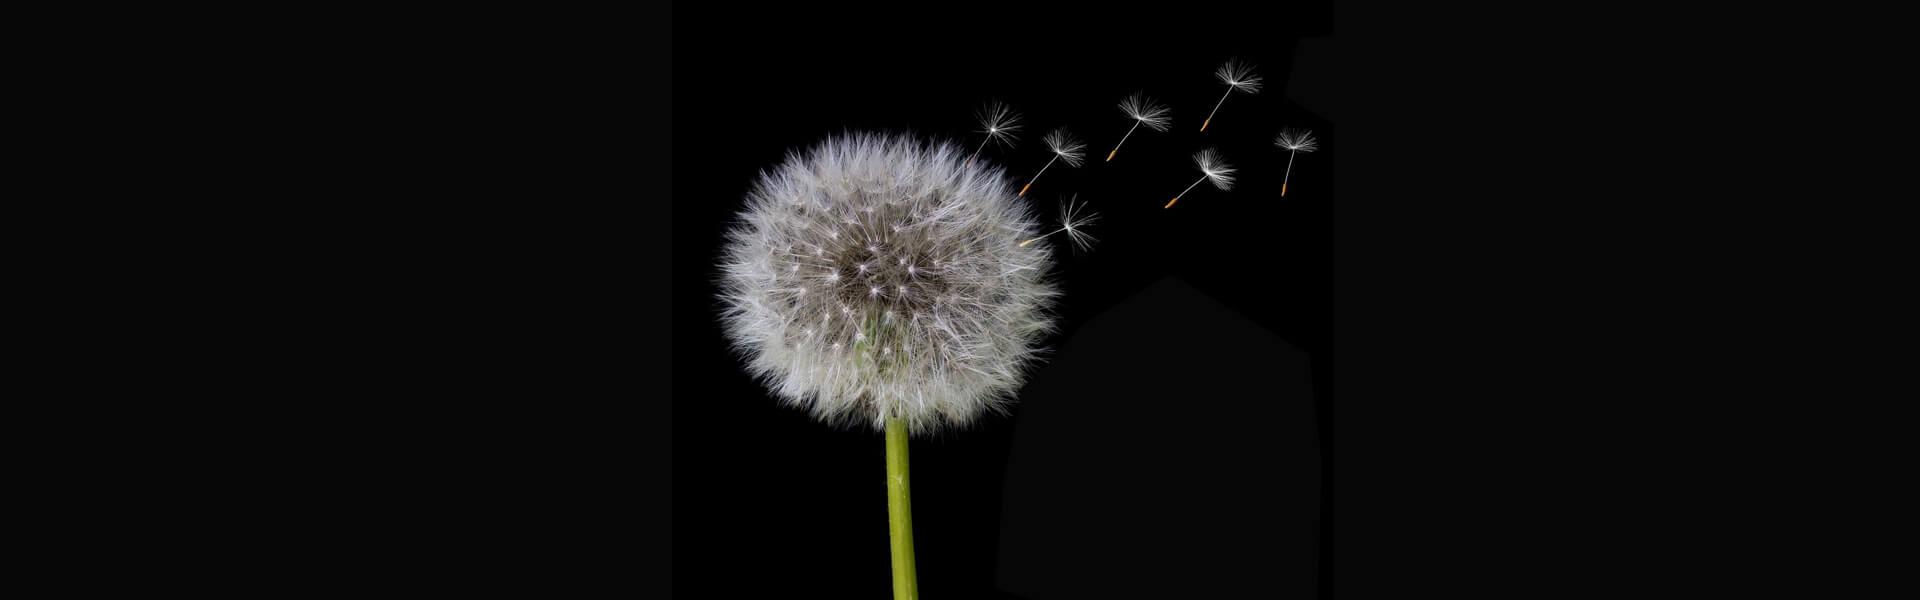 5 Ways to Survive Allergy Season Naturally